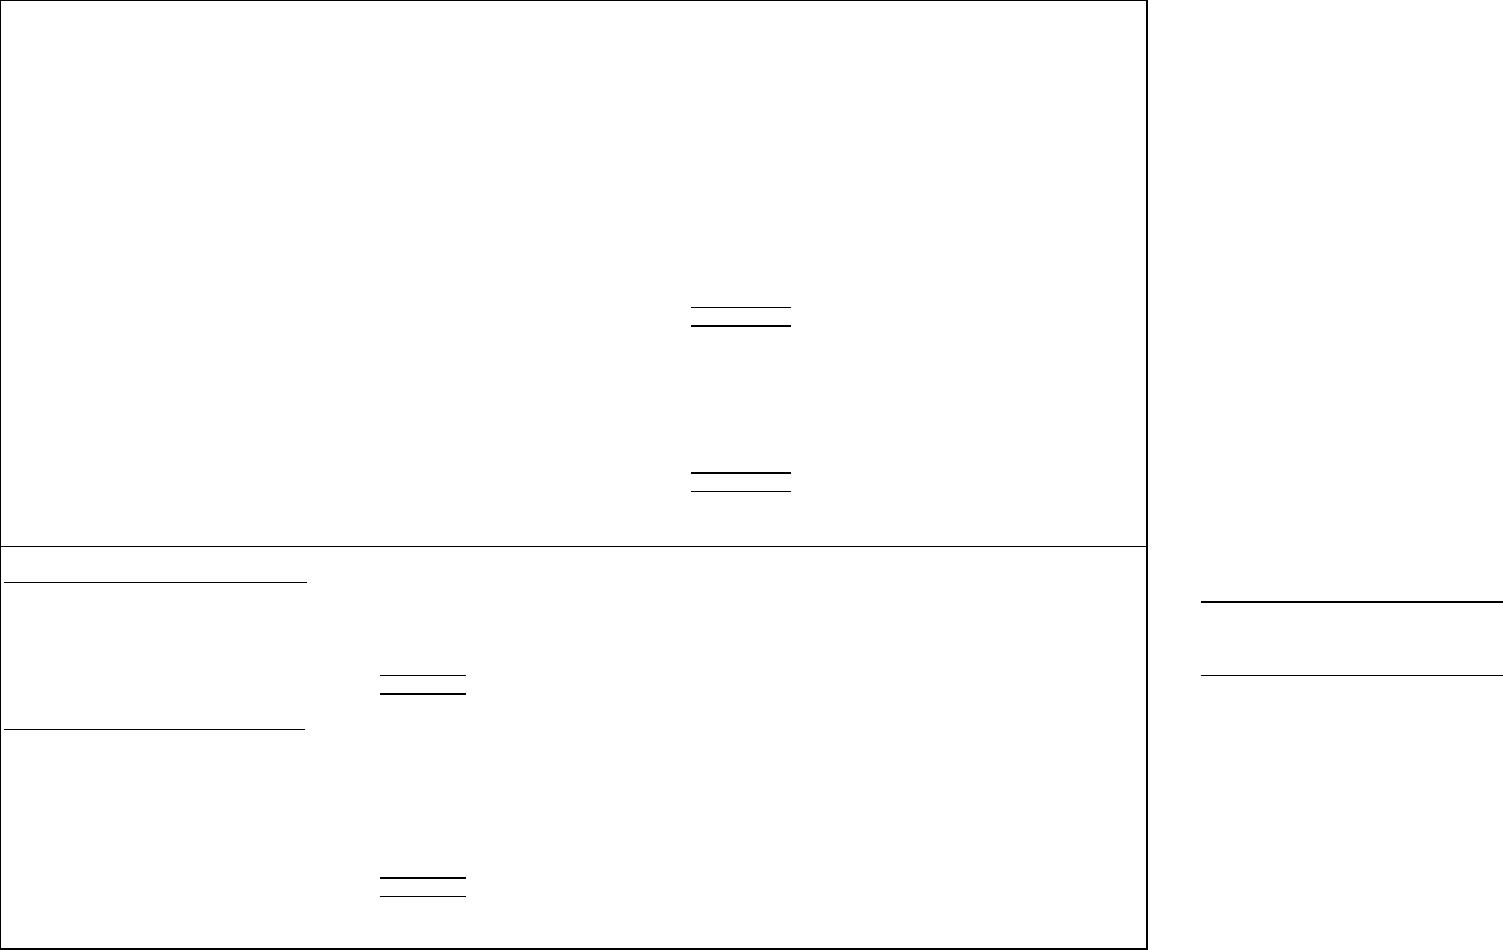 bank reconciliation sheets